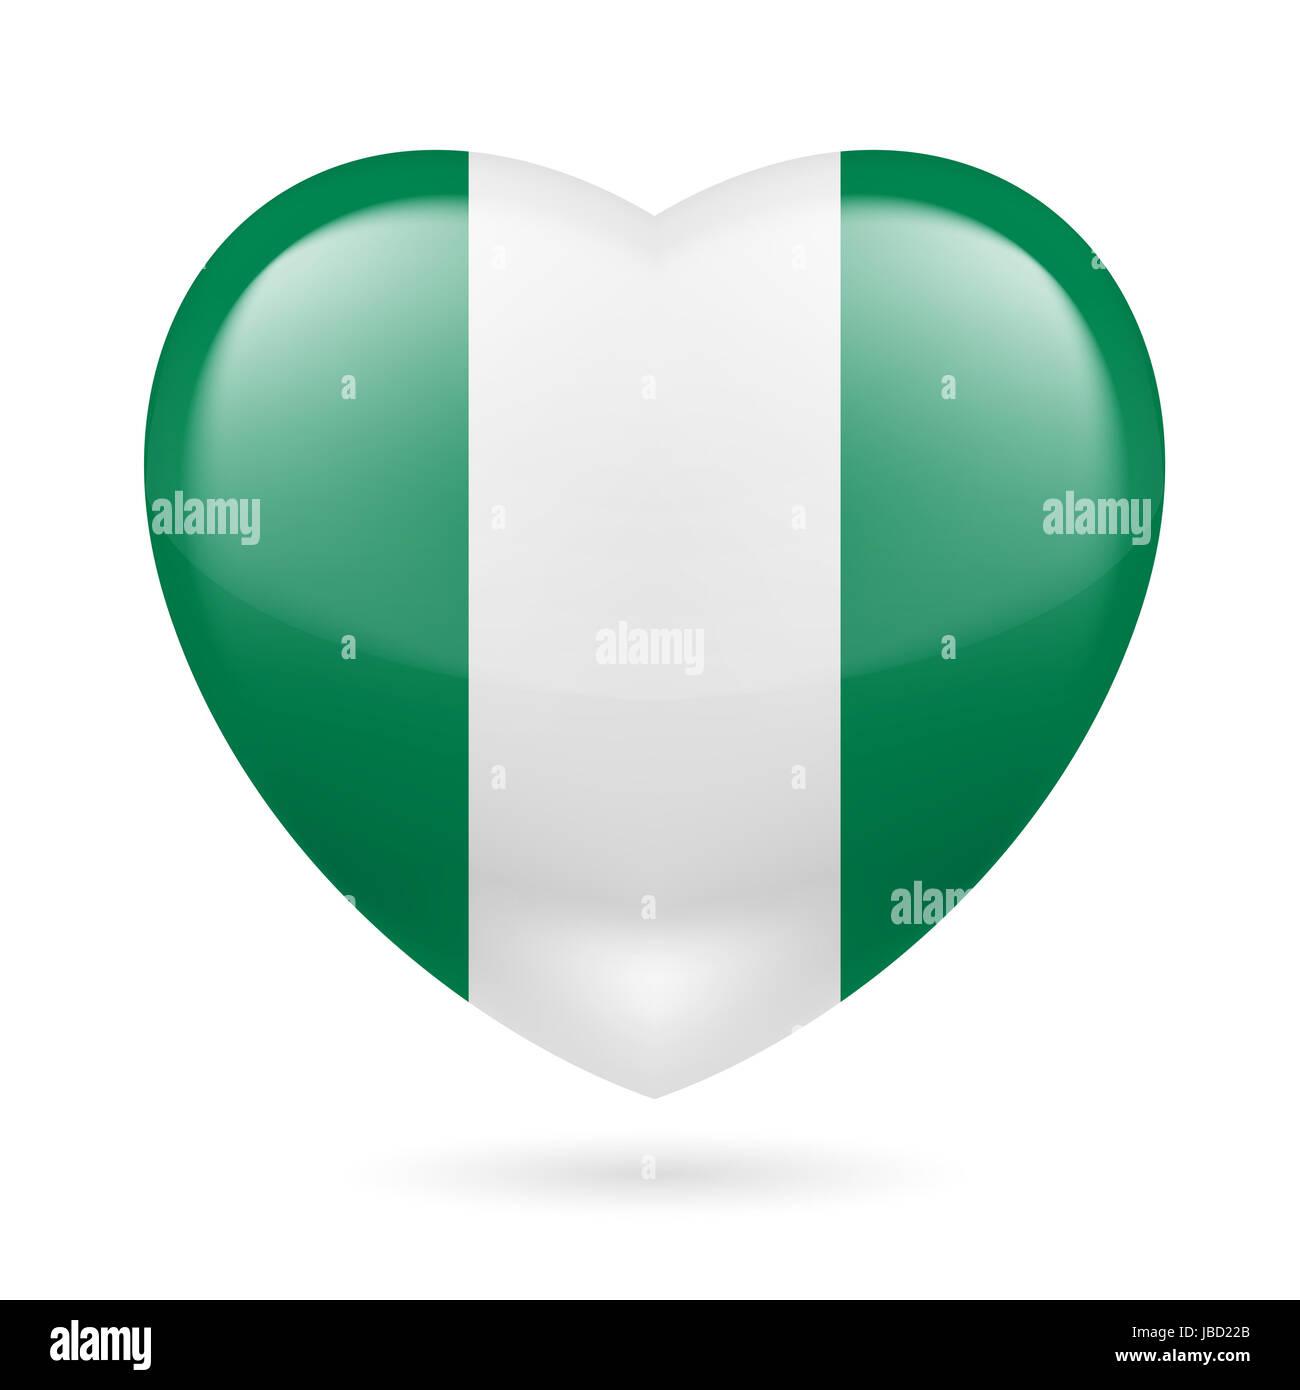 Heart with nigerian flag colors i love nigeria stock photo heart with nigerian flag colors i love nigeria ccuart Choice Image